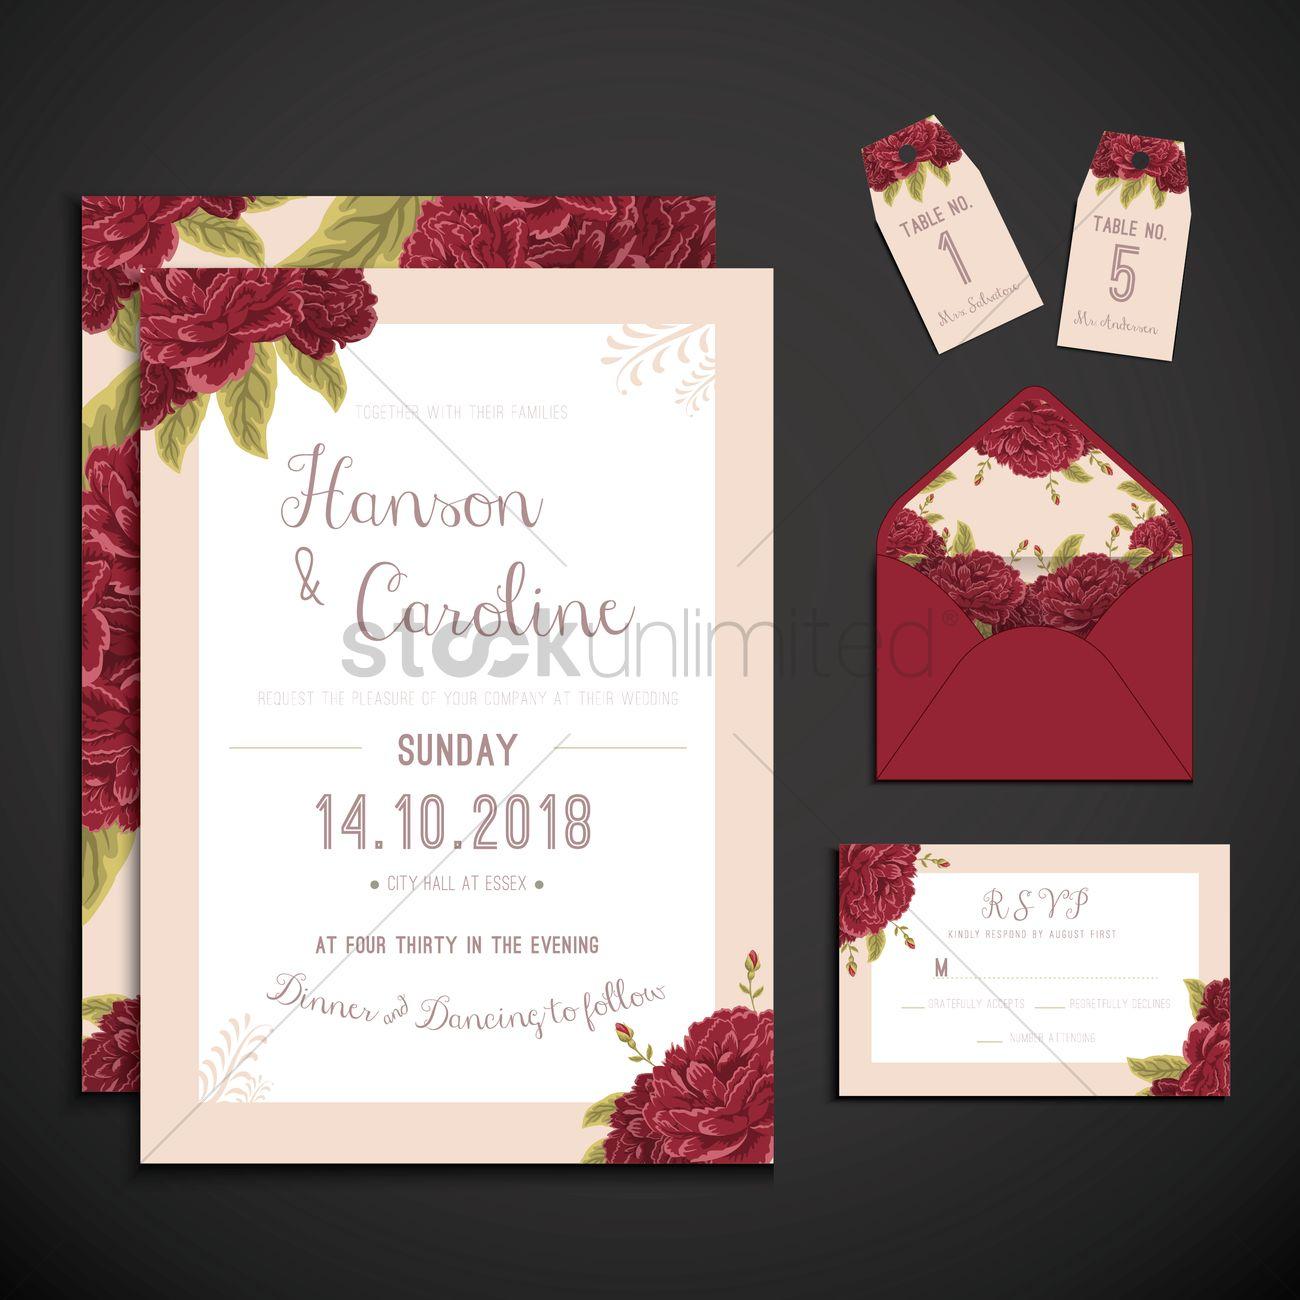 Wedding Invitation Icons Vector Image 1808114 Stockunlimited